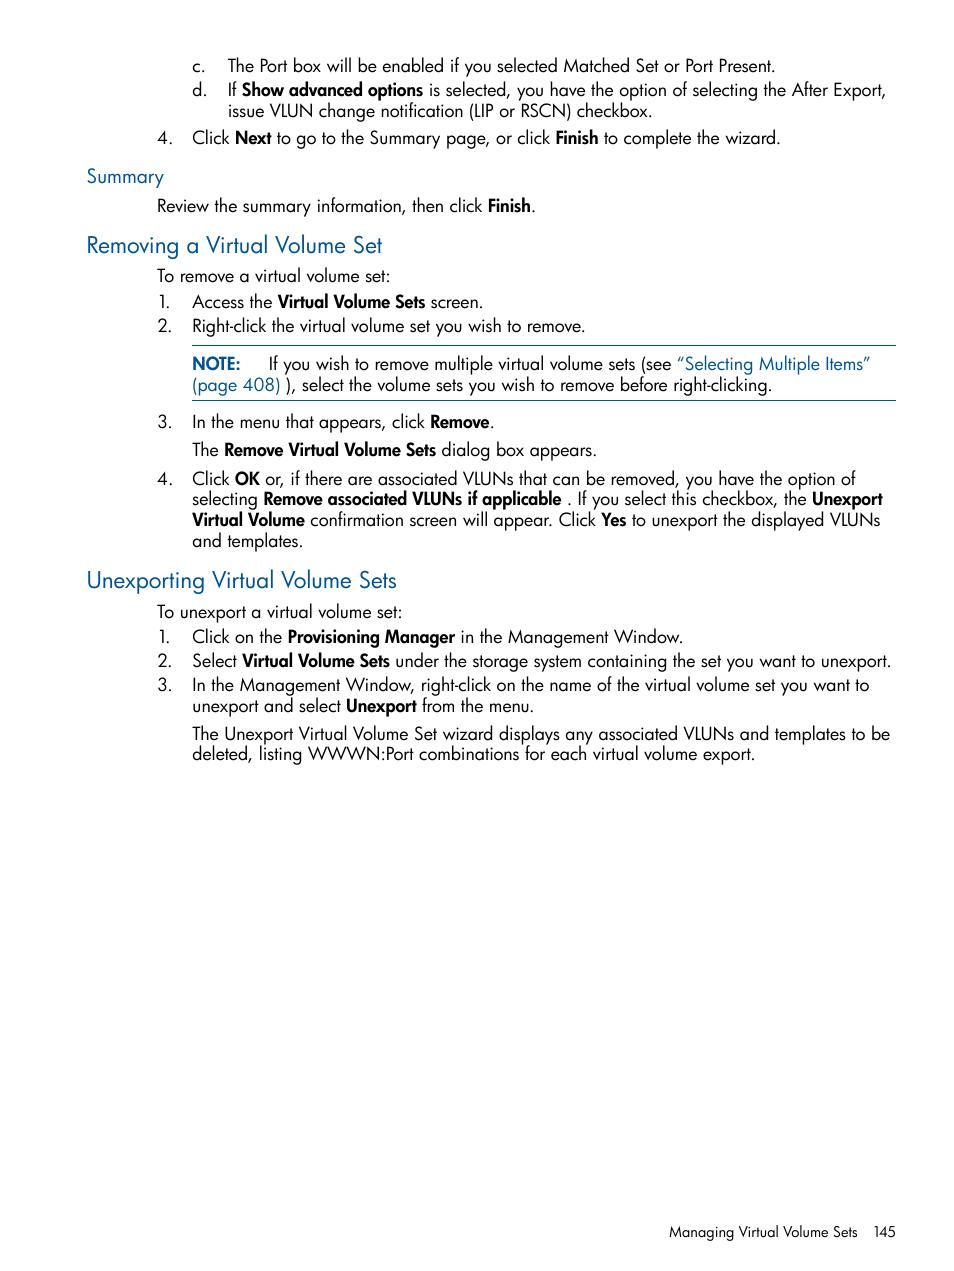 Summary, Removing a virtual volume set, Unexporting virtual